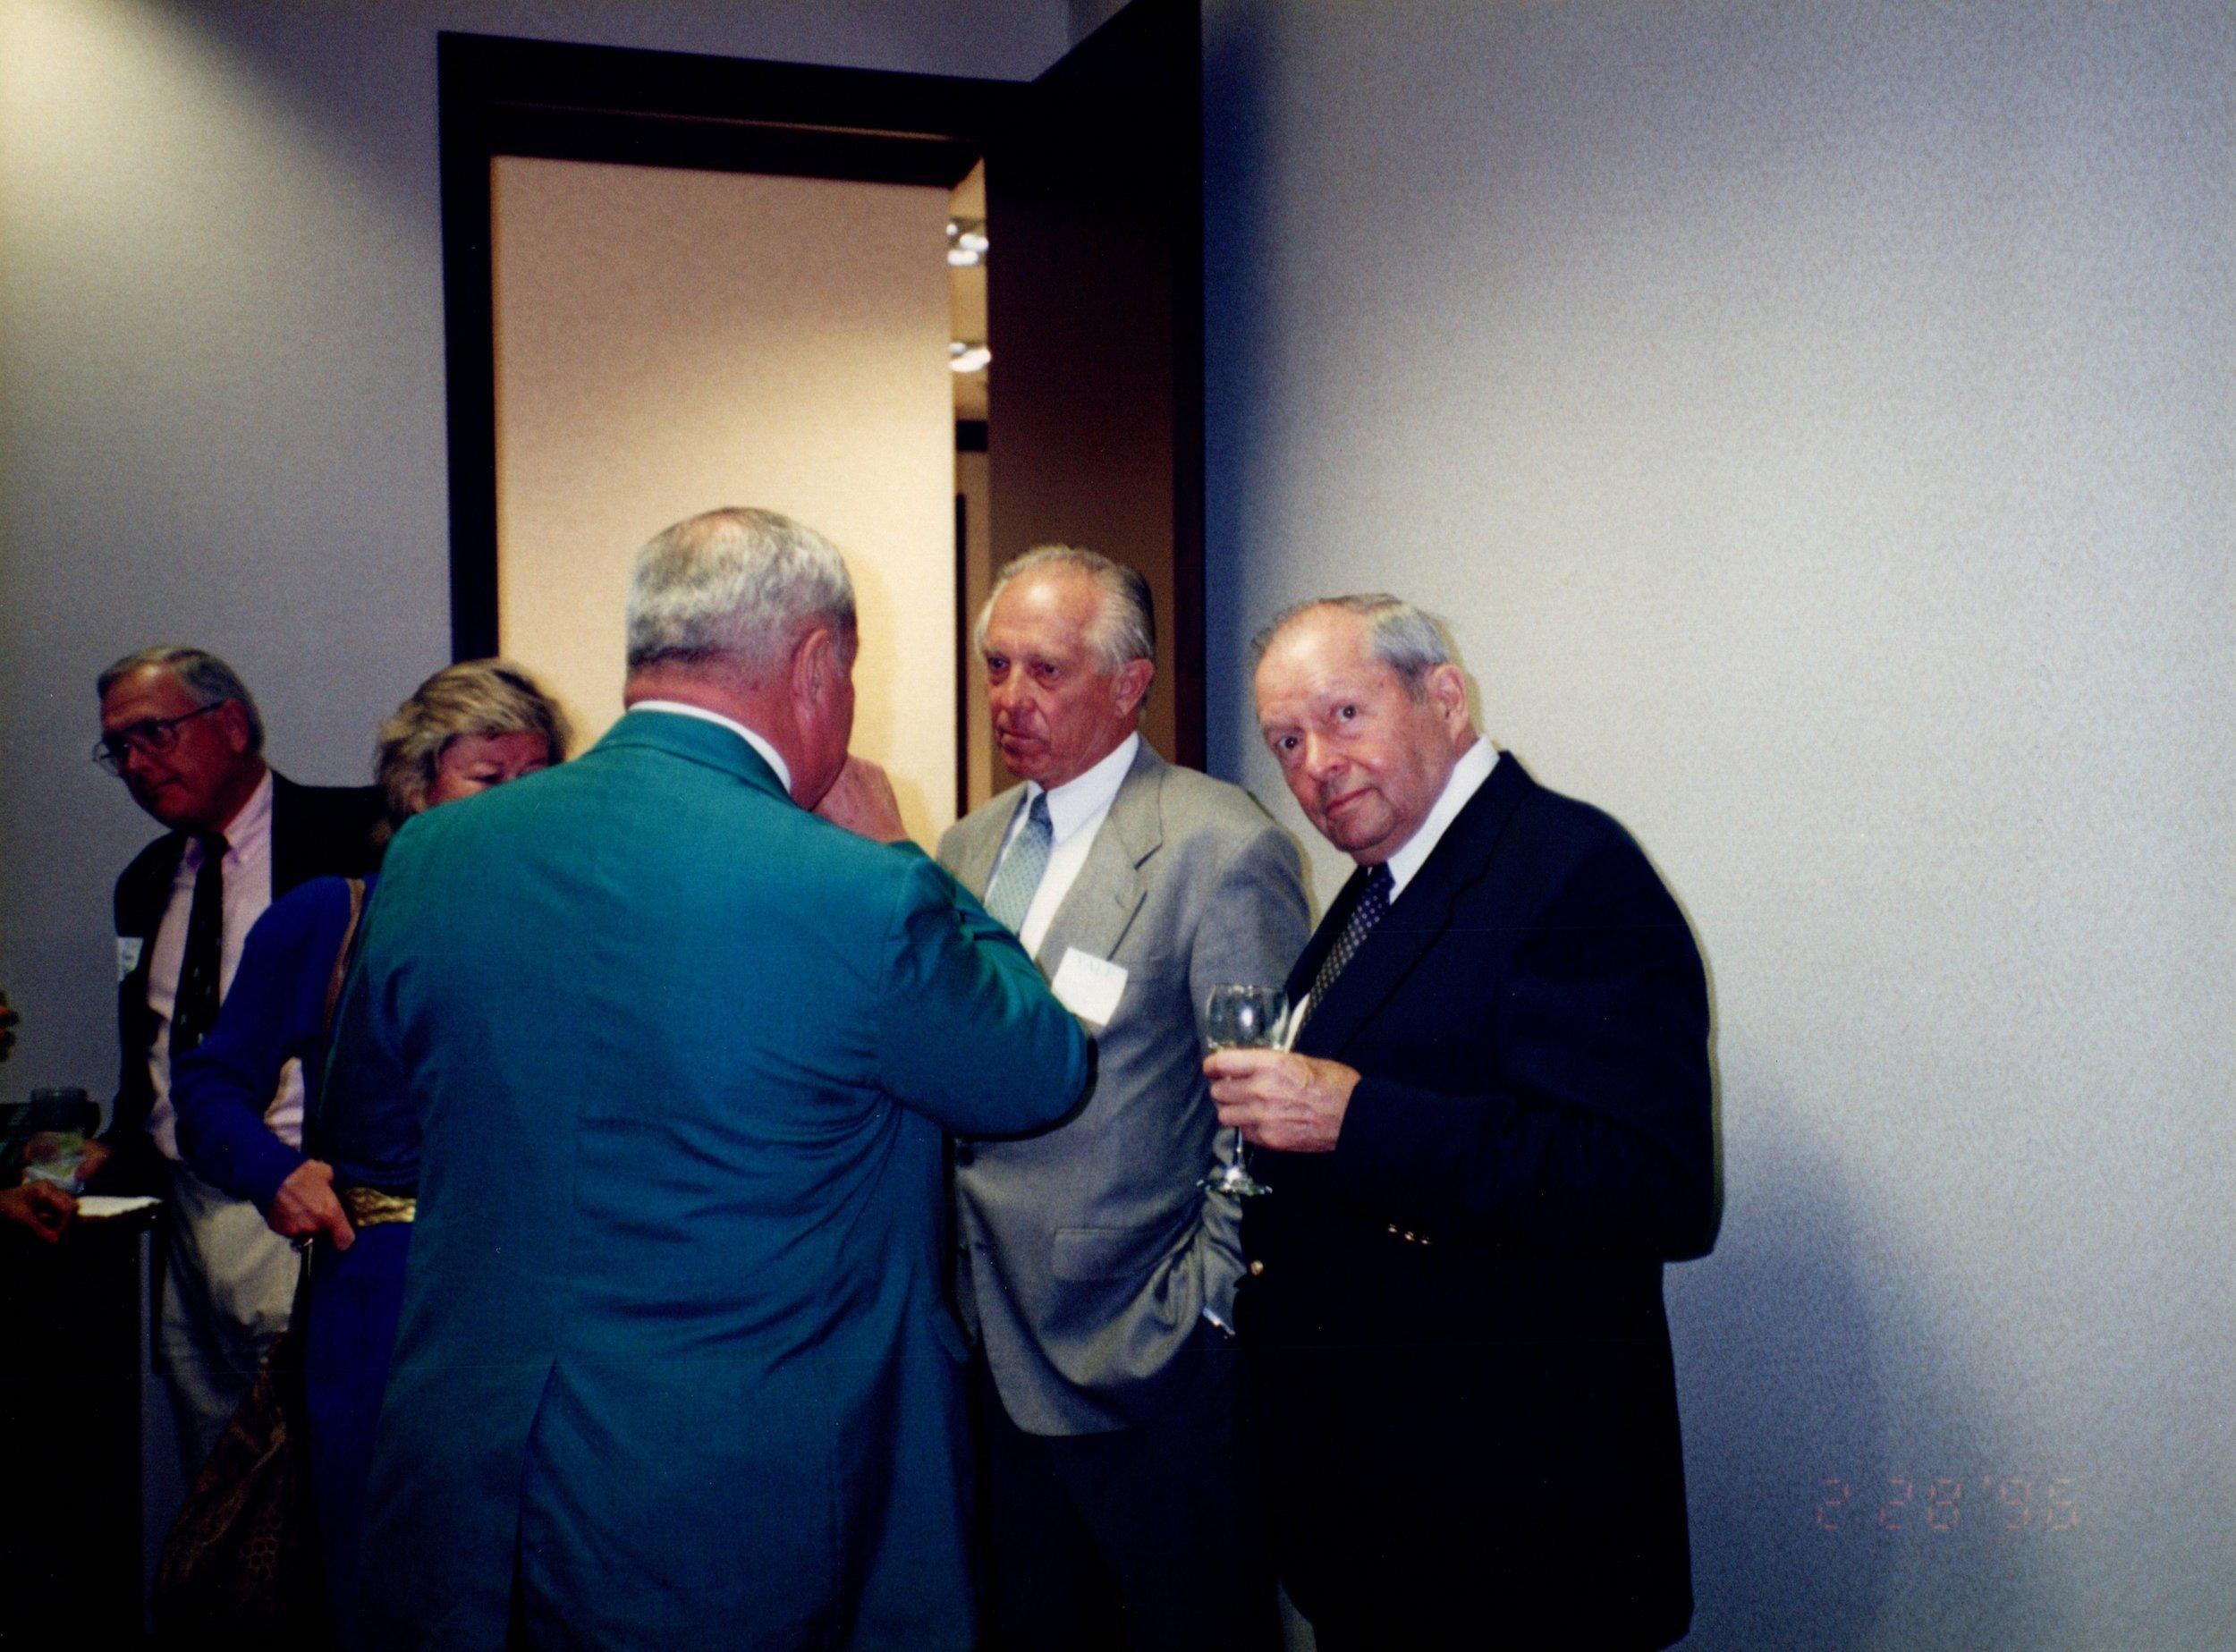 TOMMY FOSTER '56, RICHARD BAIRD '48, DAVID EAGLESON '49